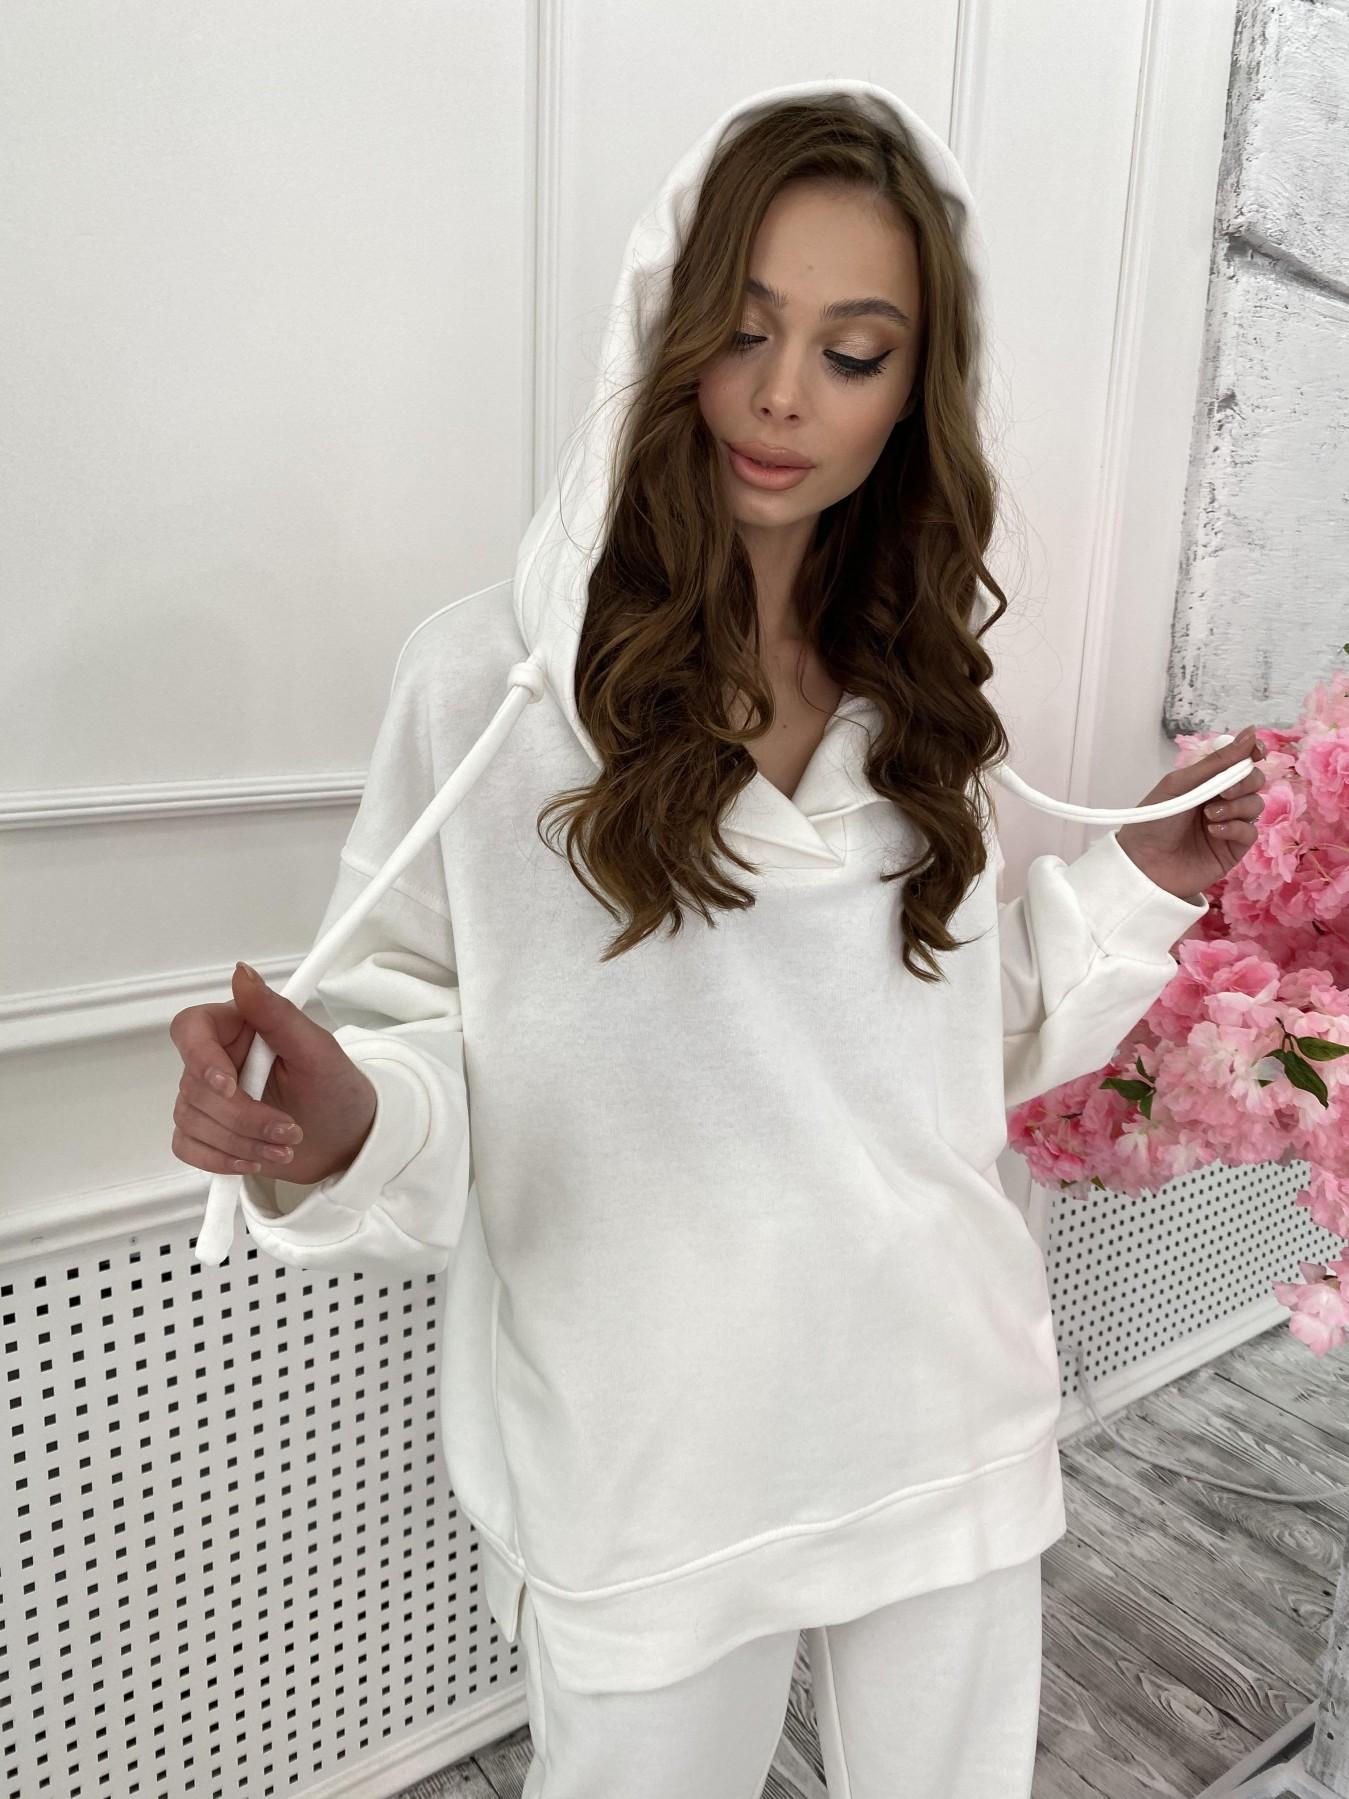 Ярис костюм из 3х нитки 10789 АРТ. 47267 Цвет: Молоко - фото 2, интернет магазин tm-modus.ru